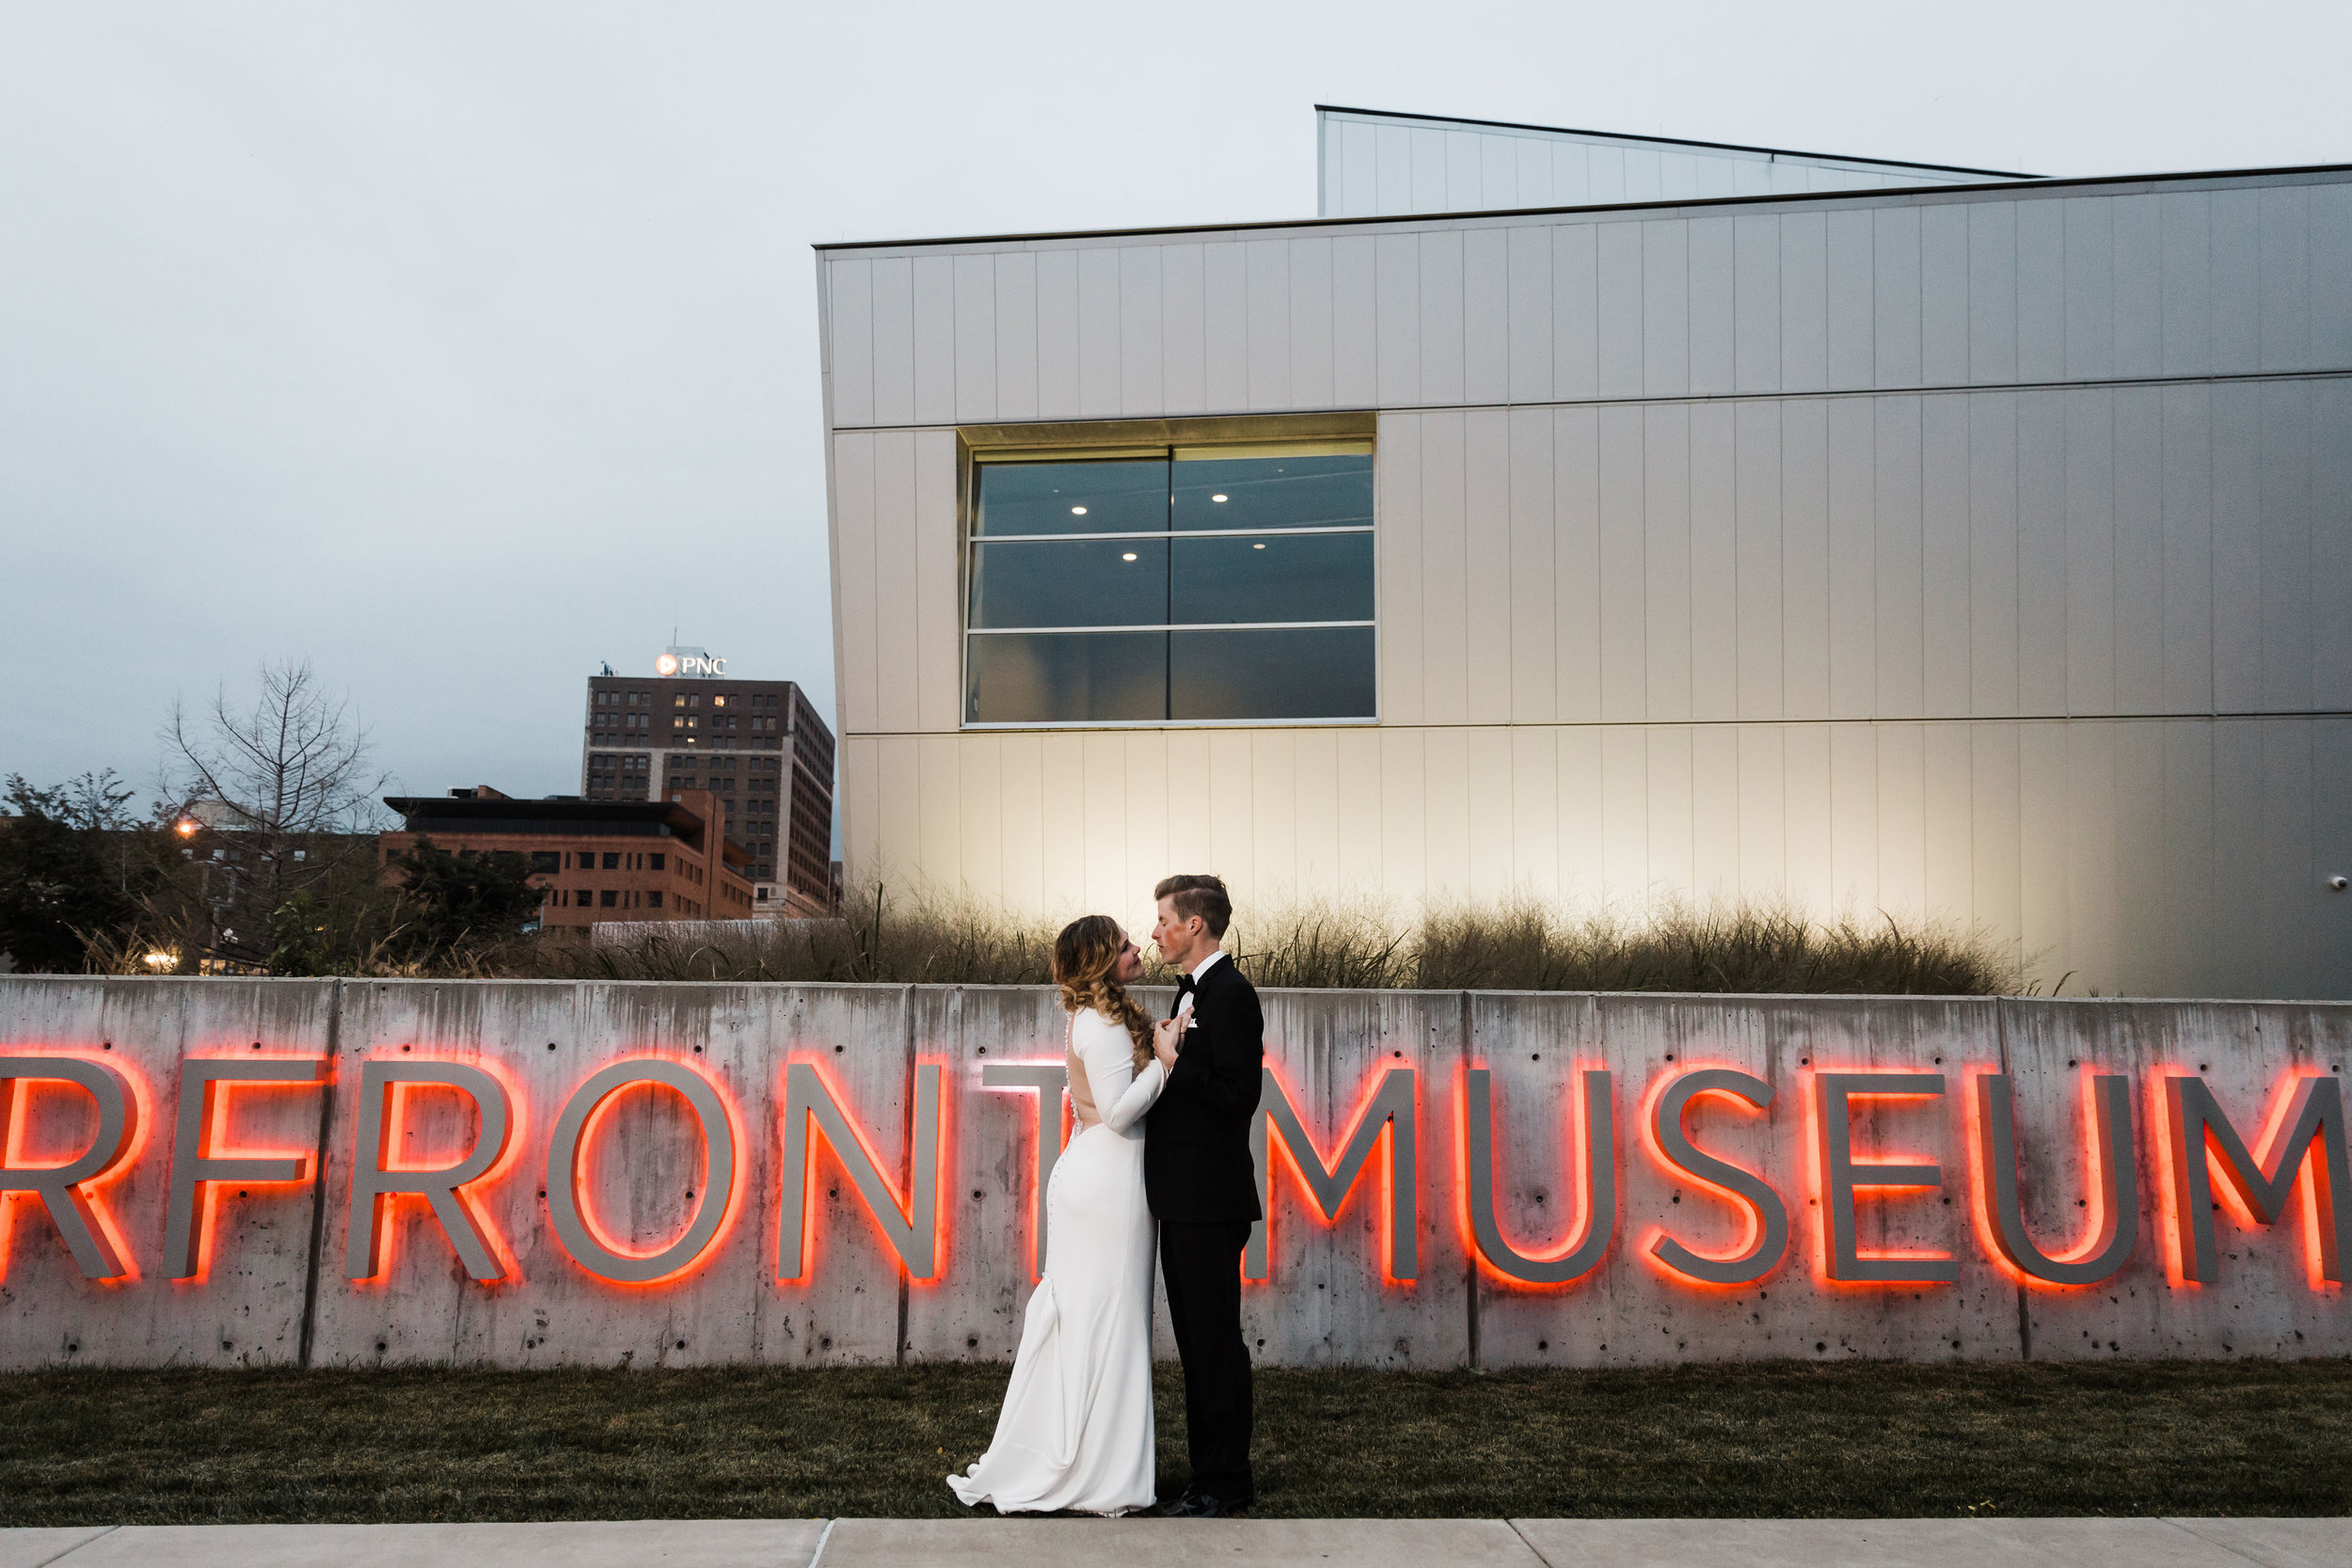 peoria riverfront museum wedding